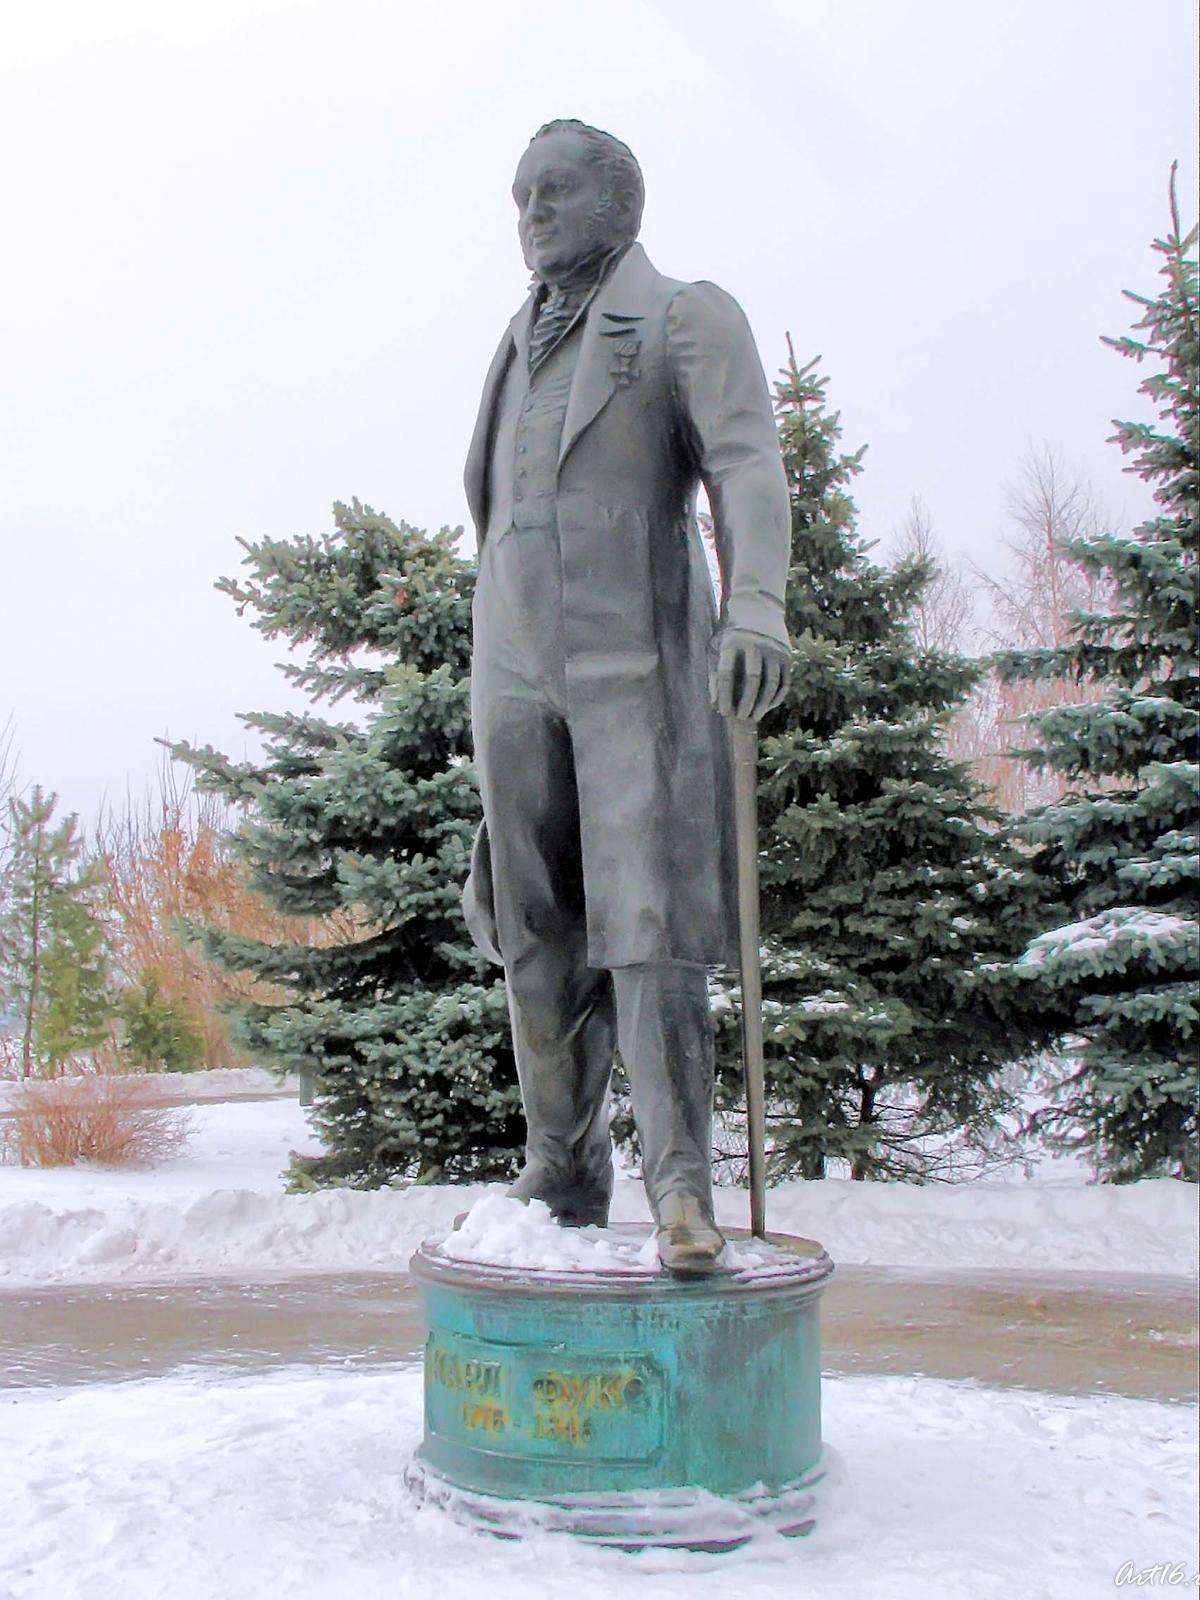 Фото №24853. Памятник К.Фуксу. Казань 2008